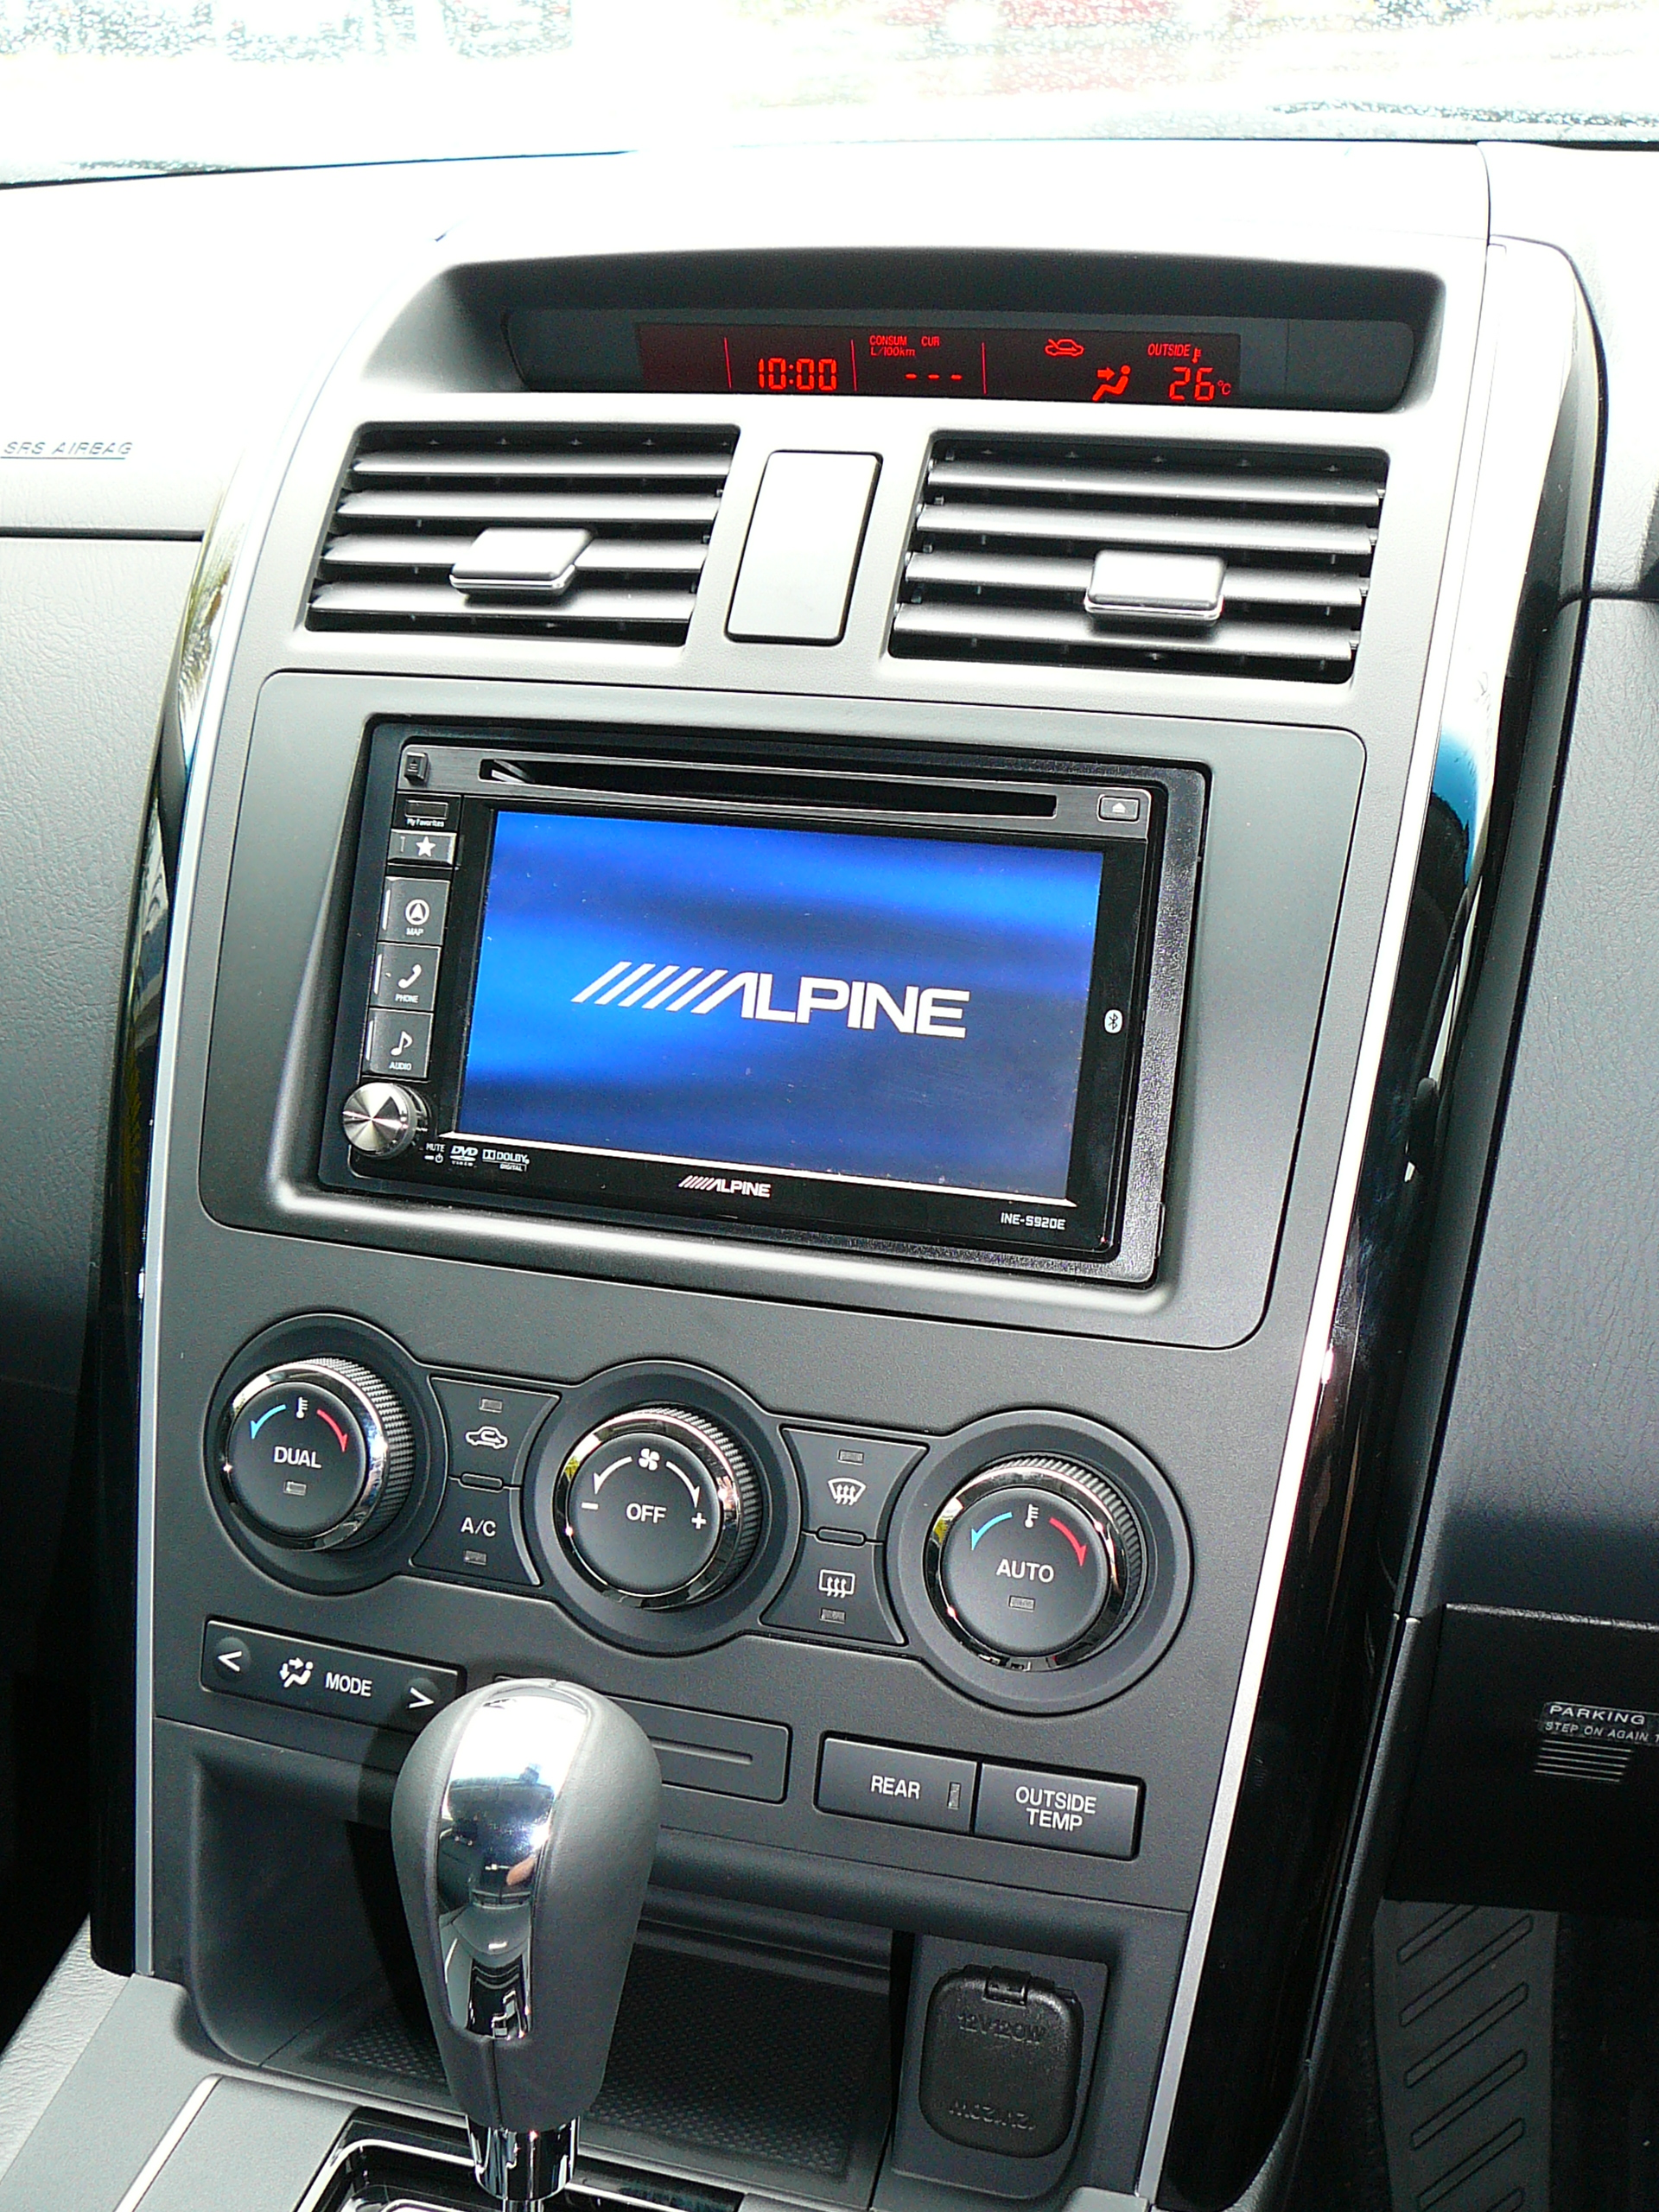 Mazda CX-9 Alpine INE-S920Ei Navigation and Reverse Camera System